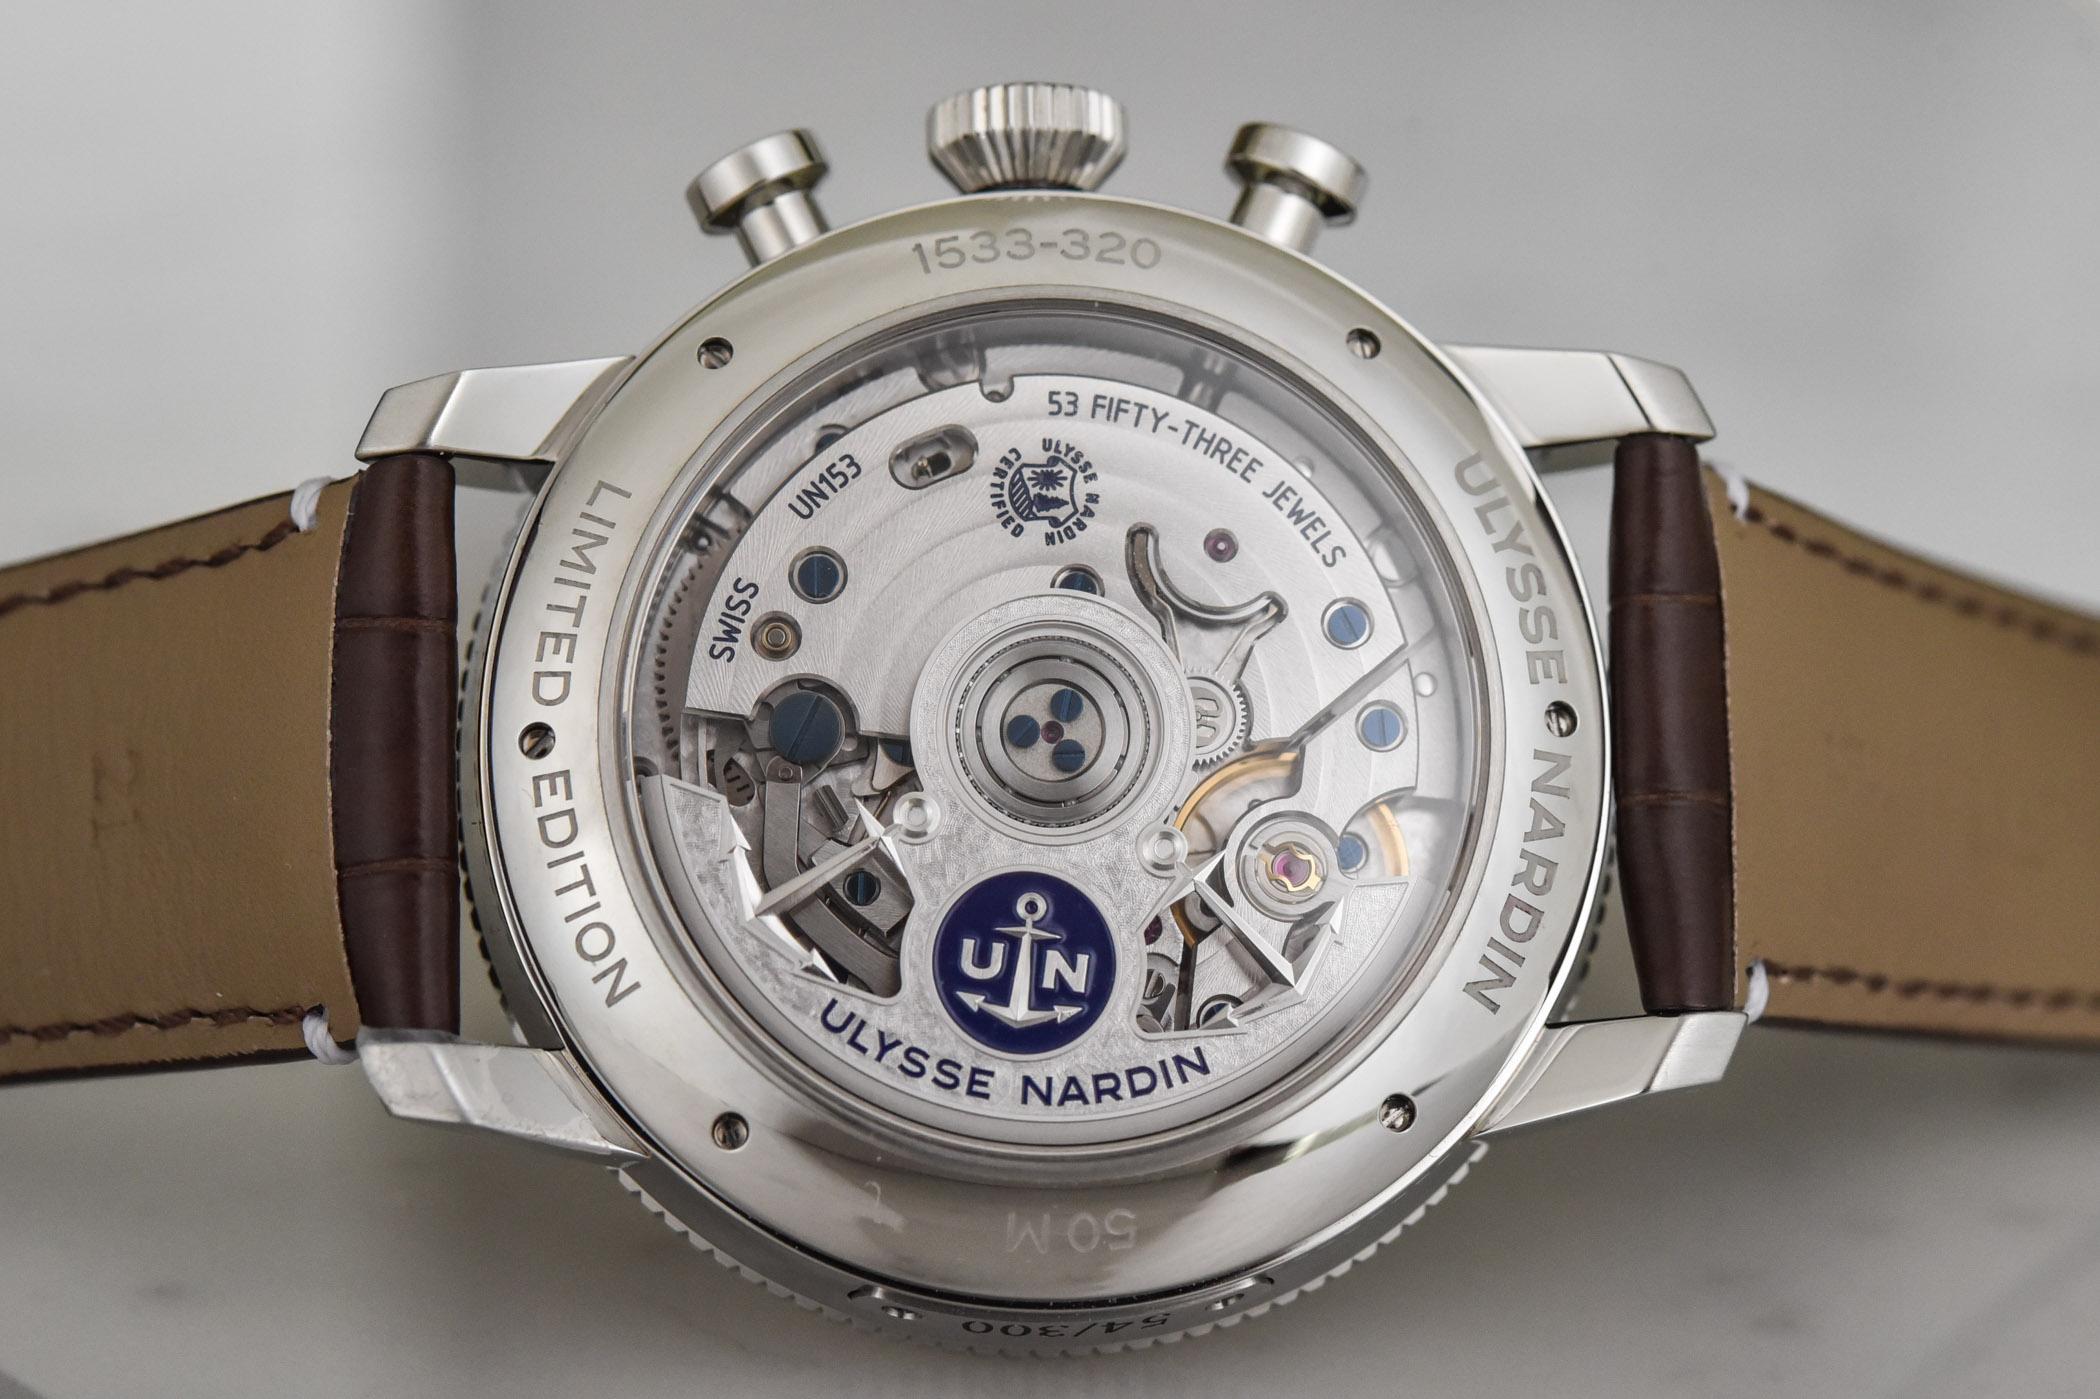 Ulysse Nardin Marine Torpilleur Annual Chronograph 44mm 1533-320LE-0A-175:1A- 4